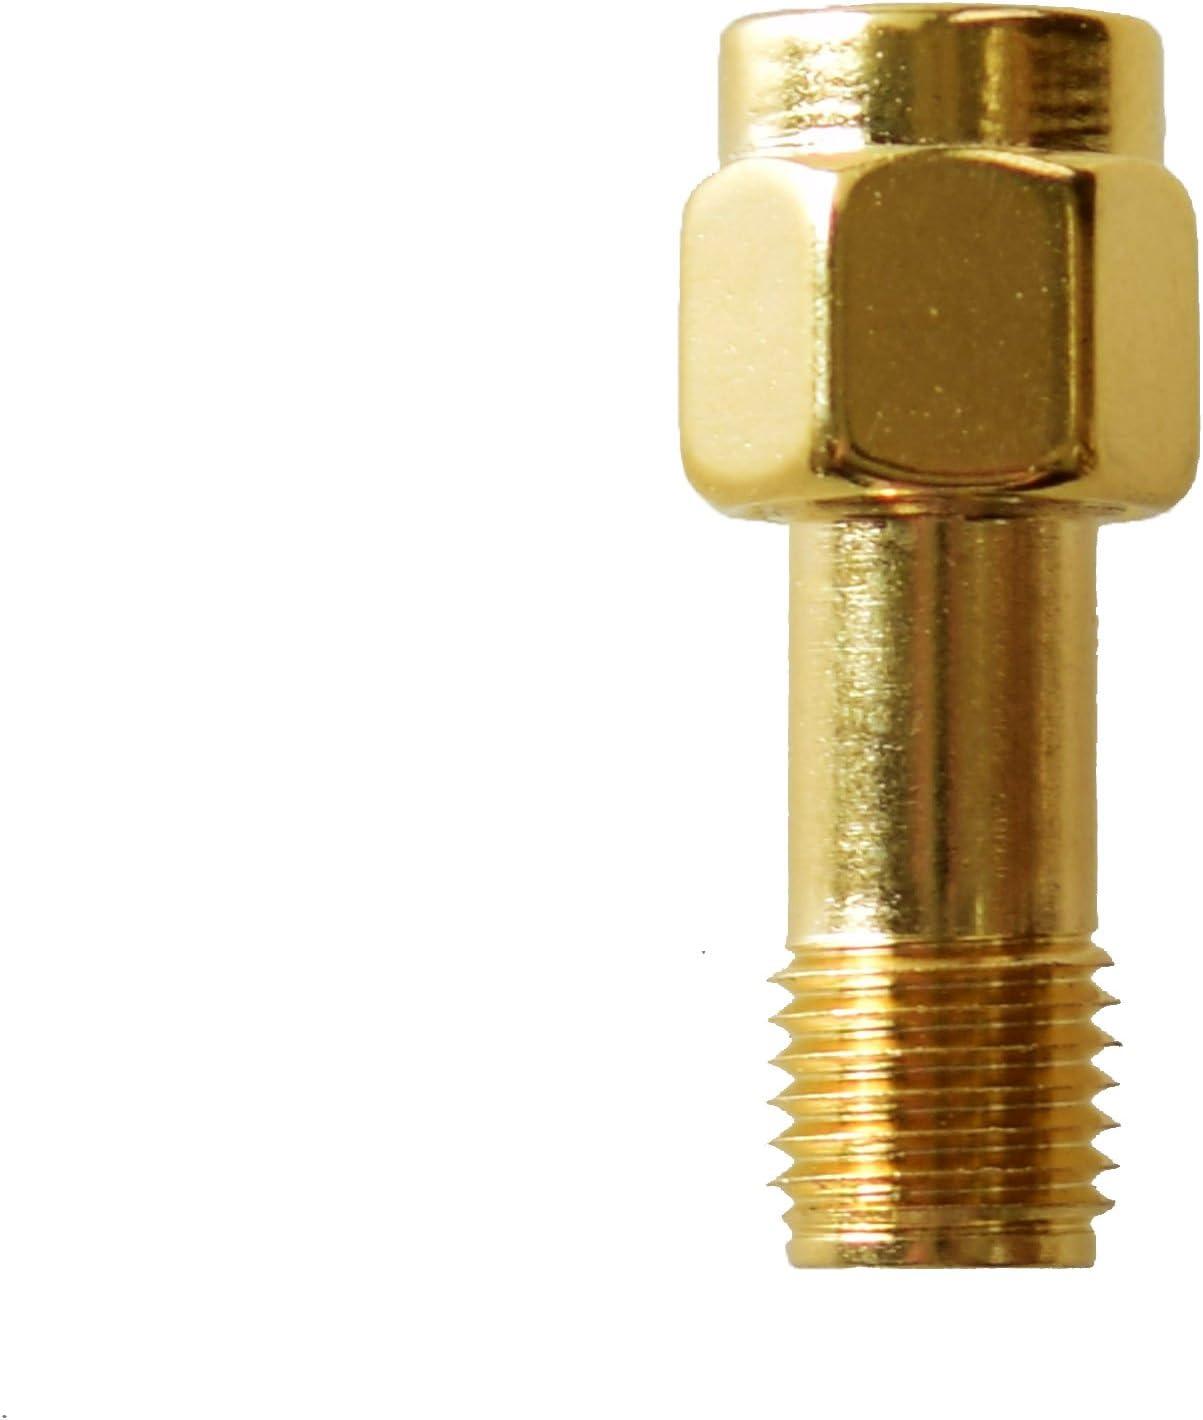 Ultracruz Goat Copper Bolus Supplement For S 25 Count X 4 Grams